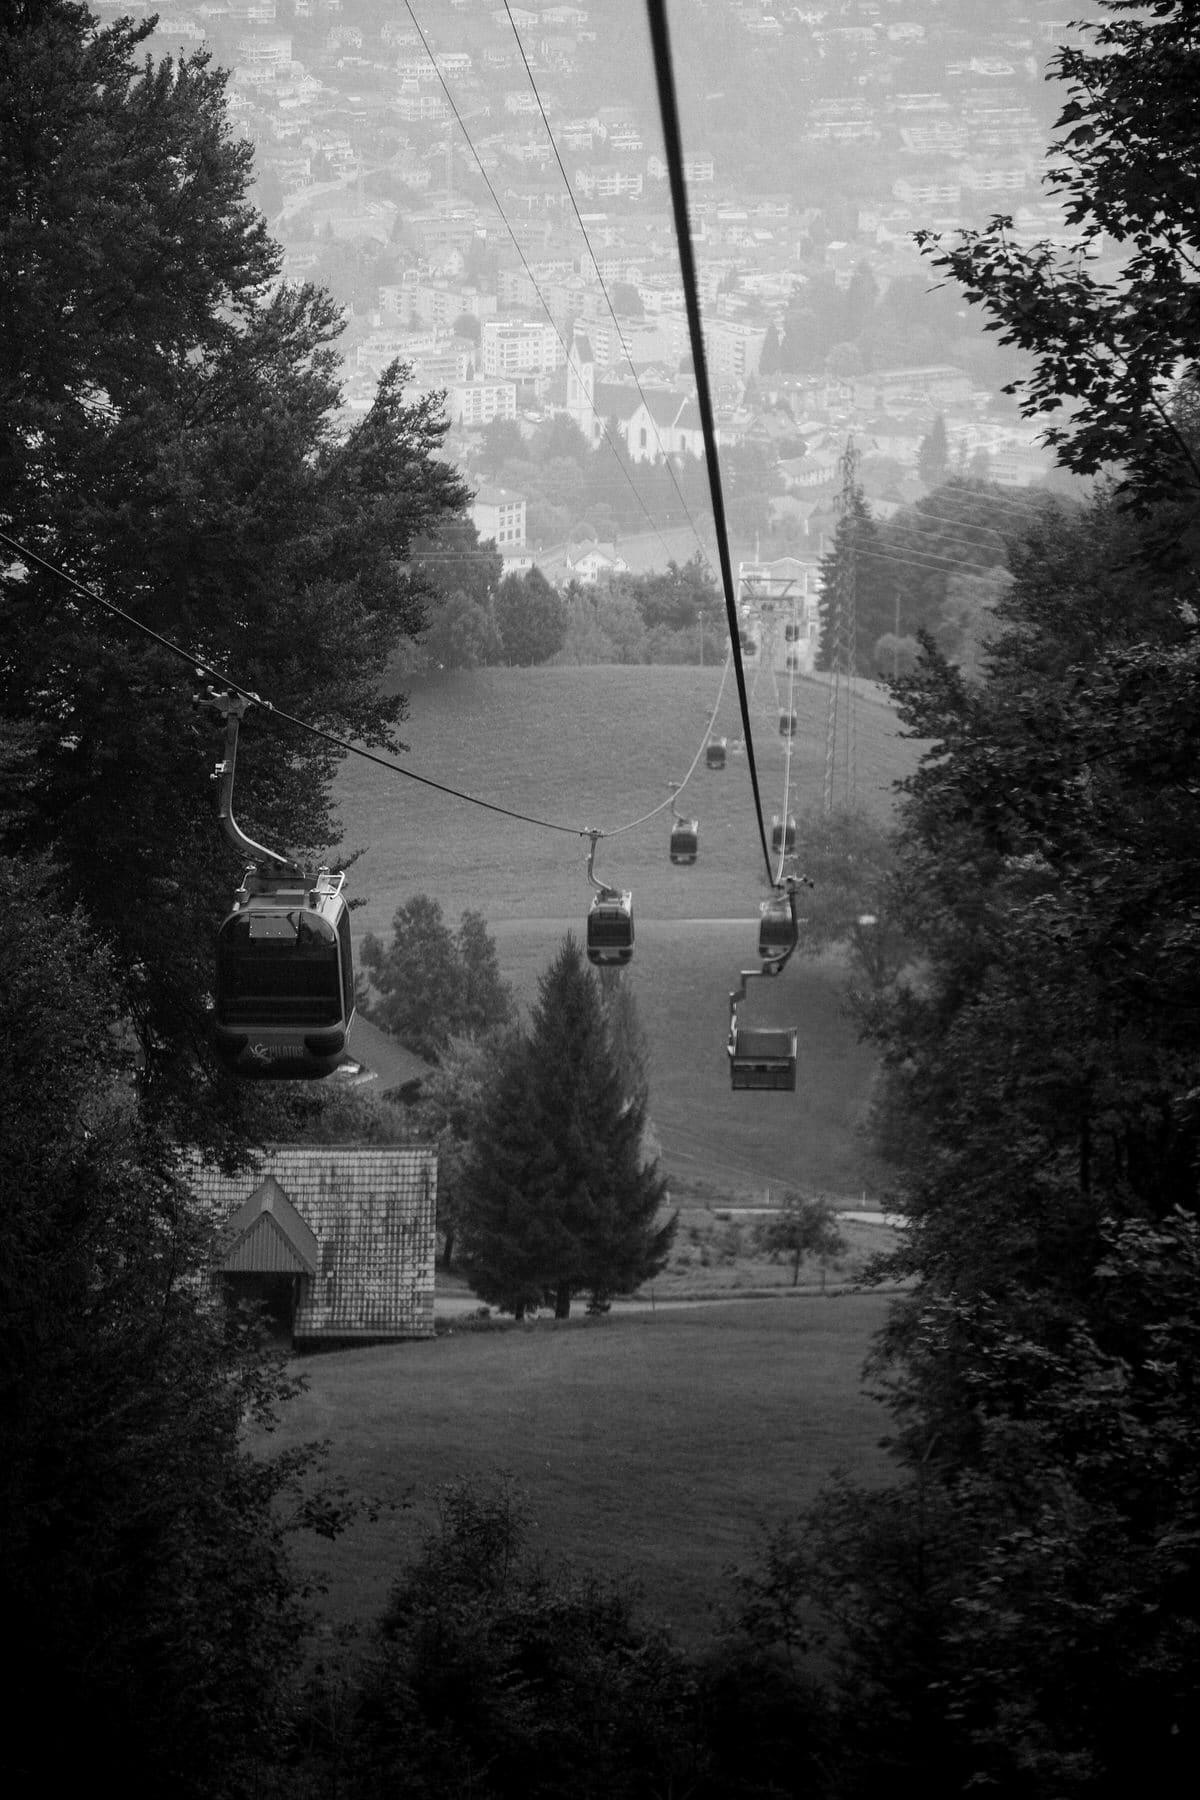 Mount_Pilatus_Lucerne_Switzerland-black-and-white-fine-art-photography-by-Studio-L-photographer-Laura-Schneider-_4428